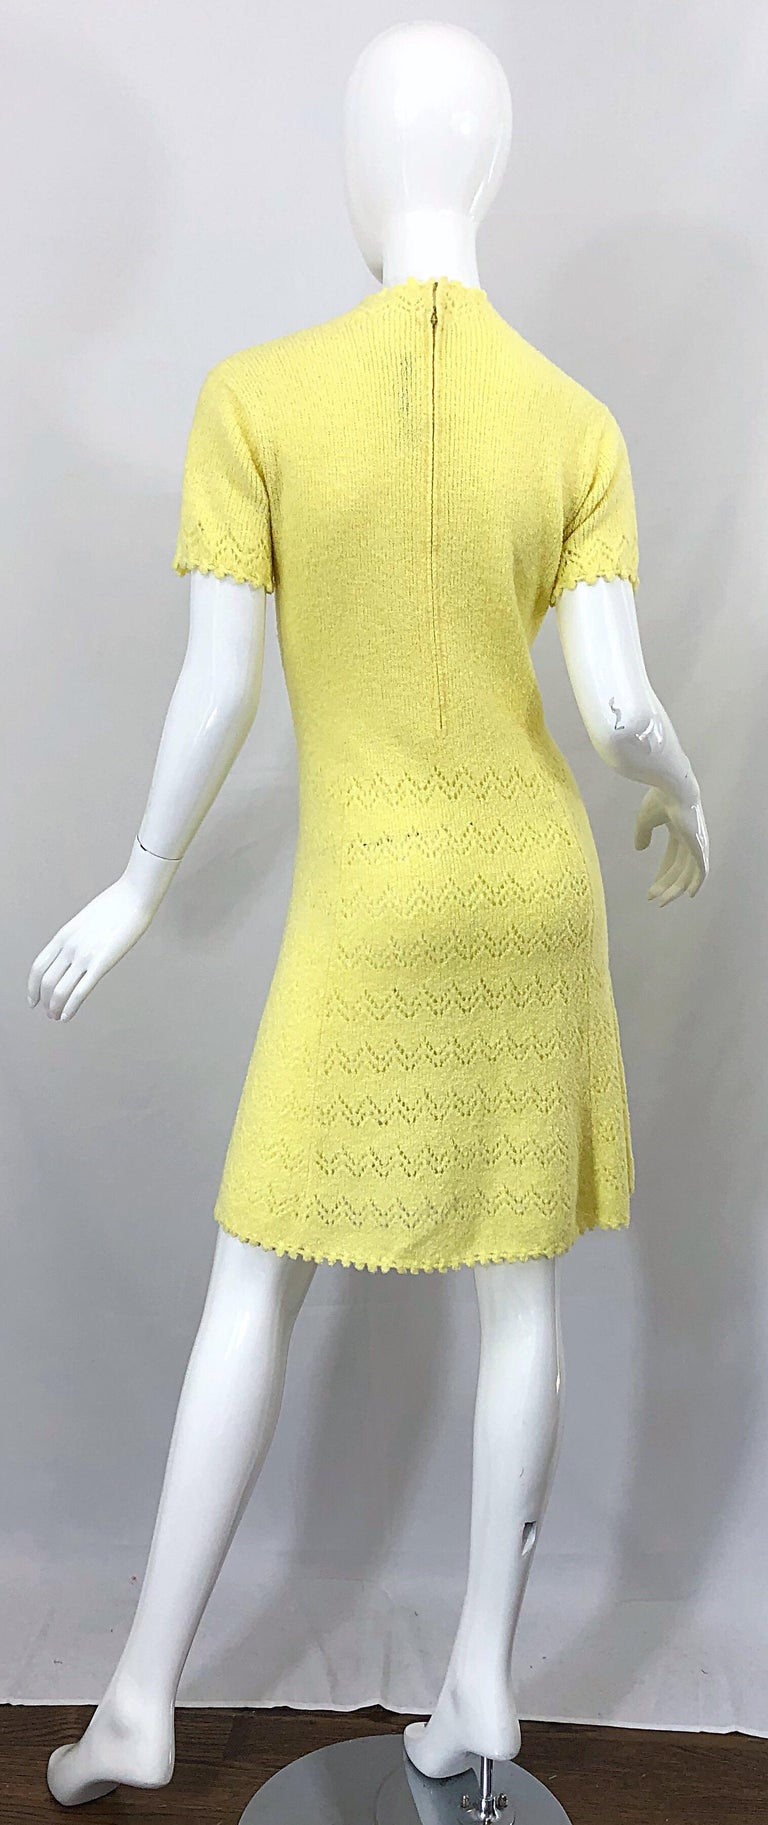 Women's 1960s St John Canary Yellow Santana Knit Mod Crochet Vintage A Line 60s Dress For Sale